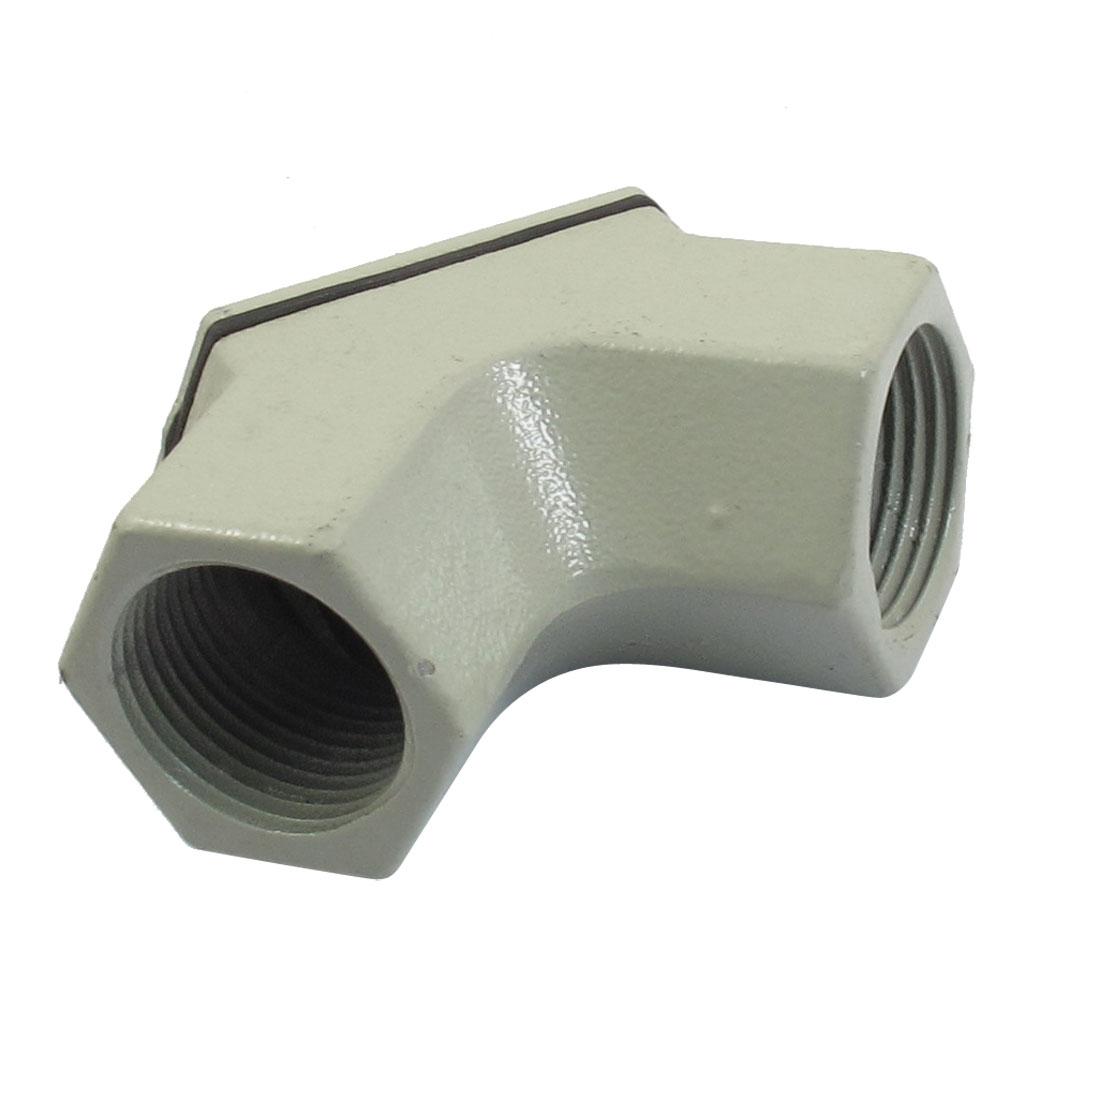 Metal-Case-Two-Hub-Ingot-Shaped-Explosion-proof-Conduit-Box-G1